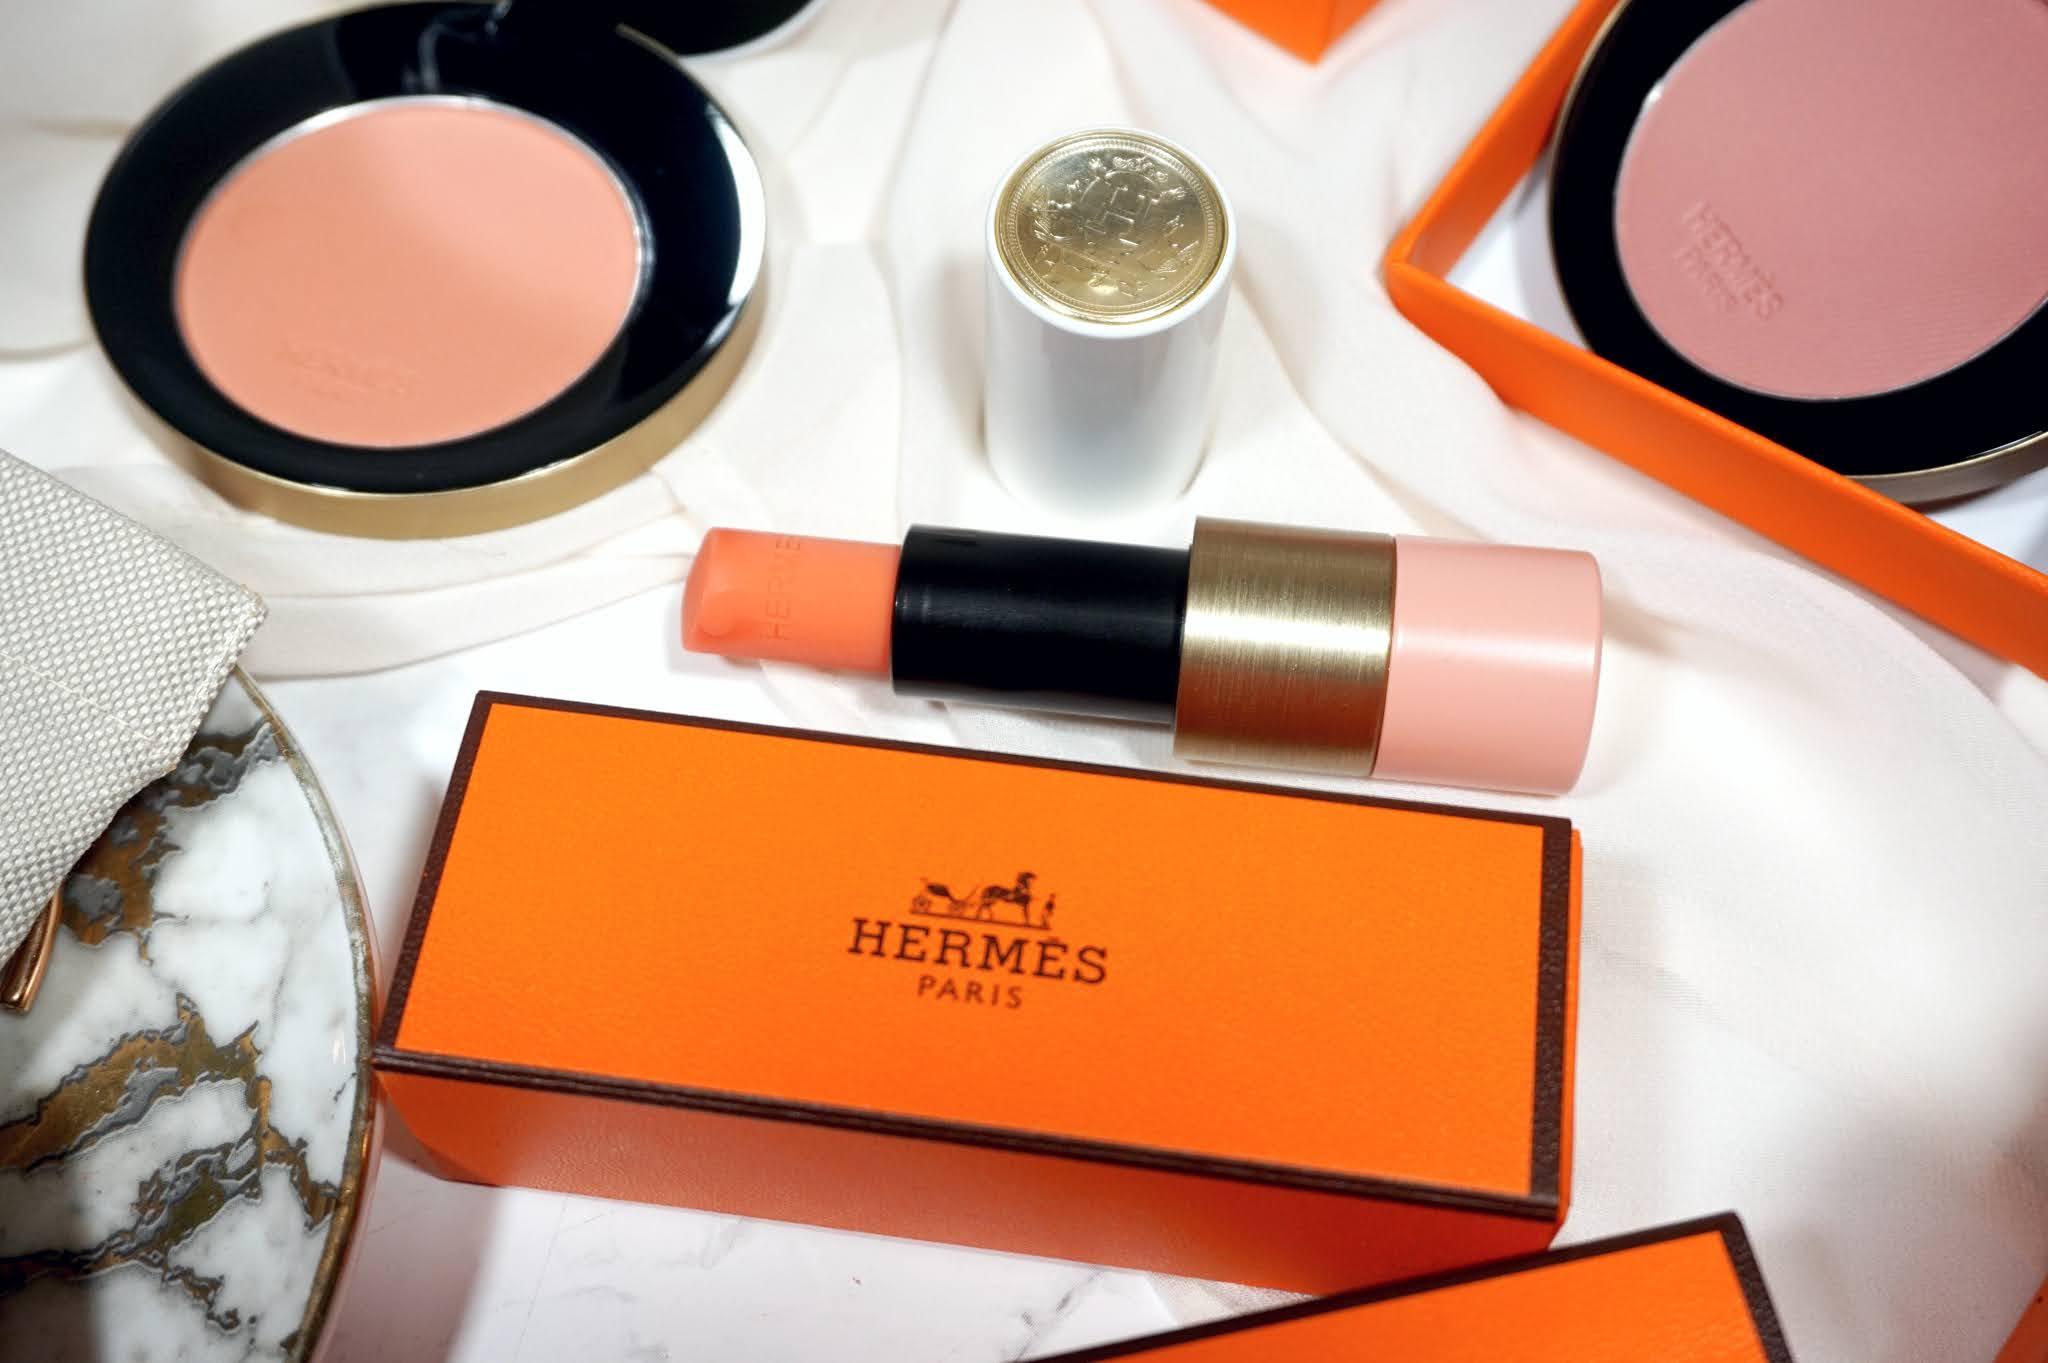 Hermès Rose Hermès - Tinted Lip Enhancer Balm Review and Swatches